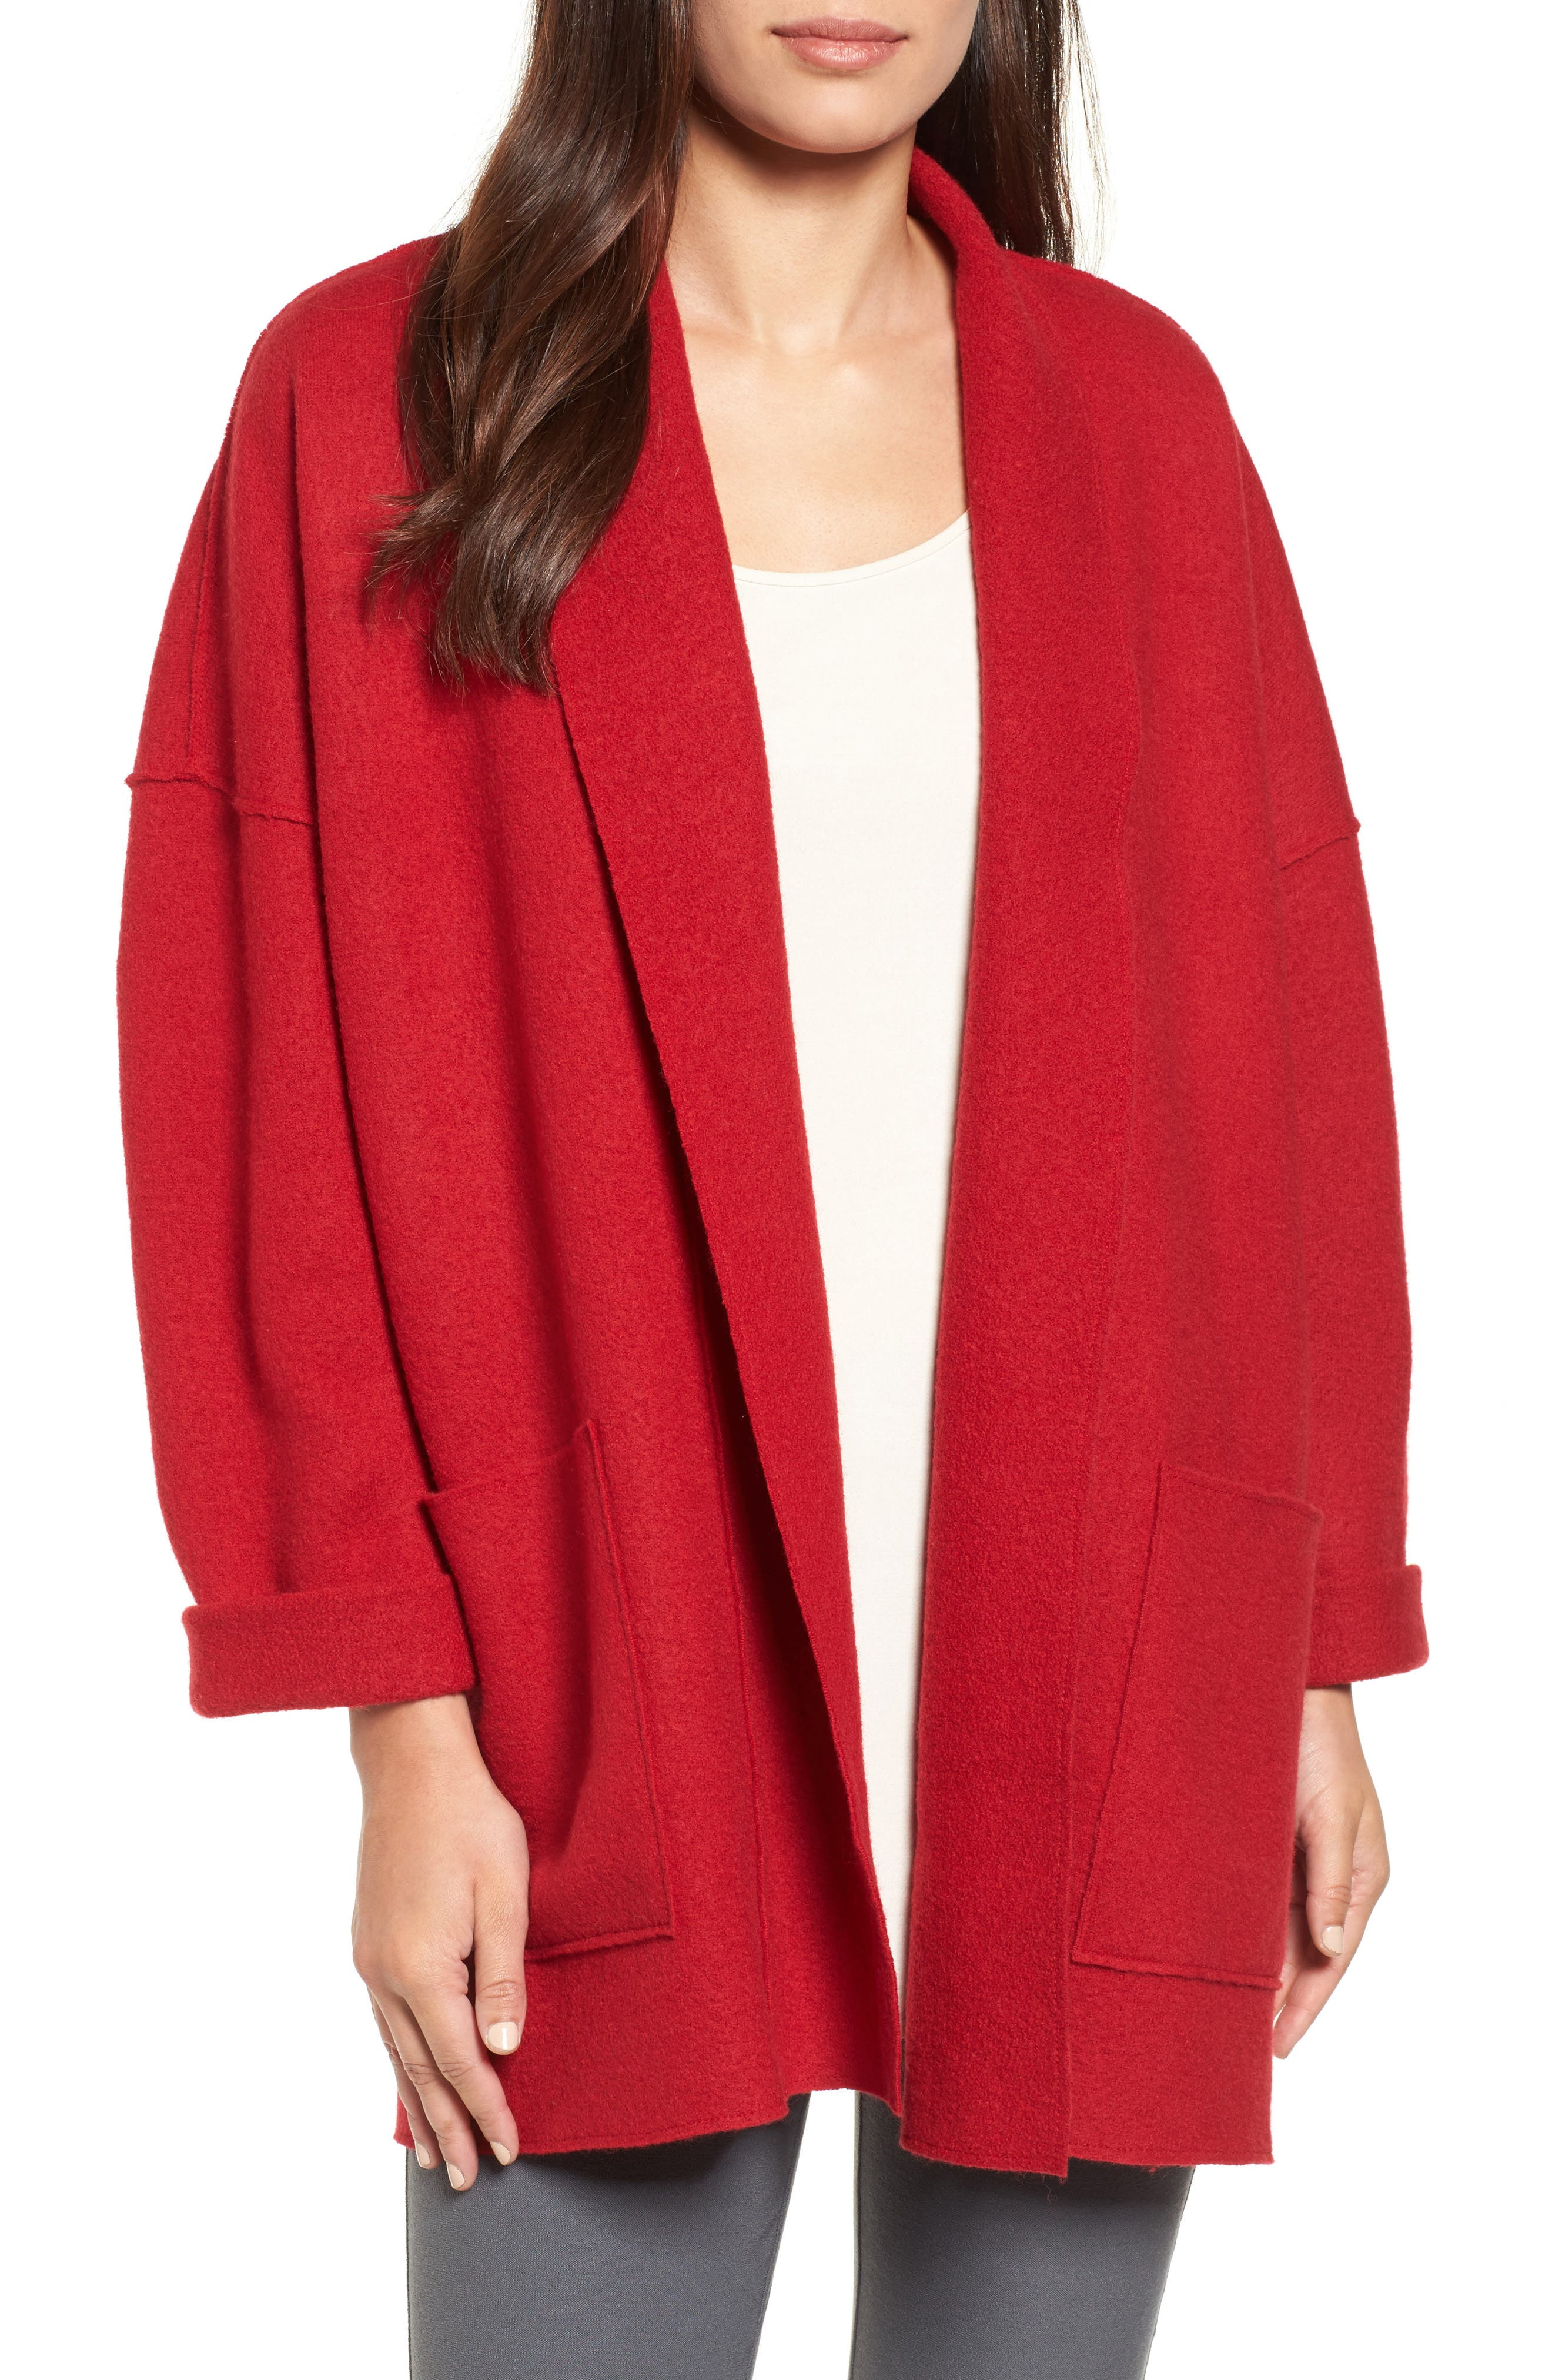 Main Image - Eileen Fisher Boiled Wool Shawl Collar Jacket (Regular & Petite)